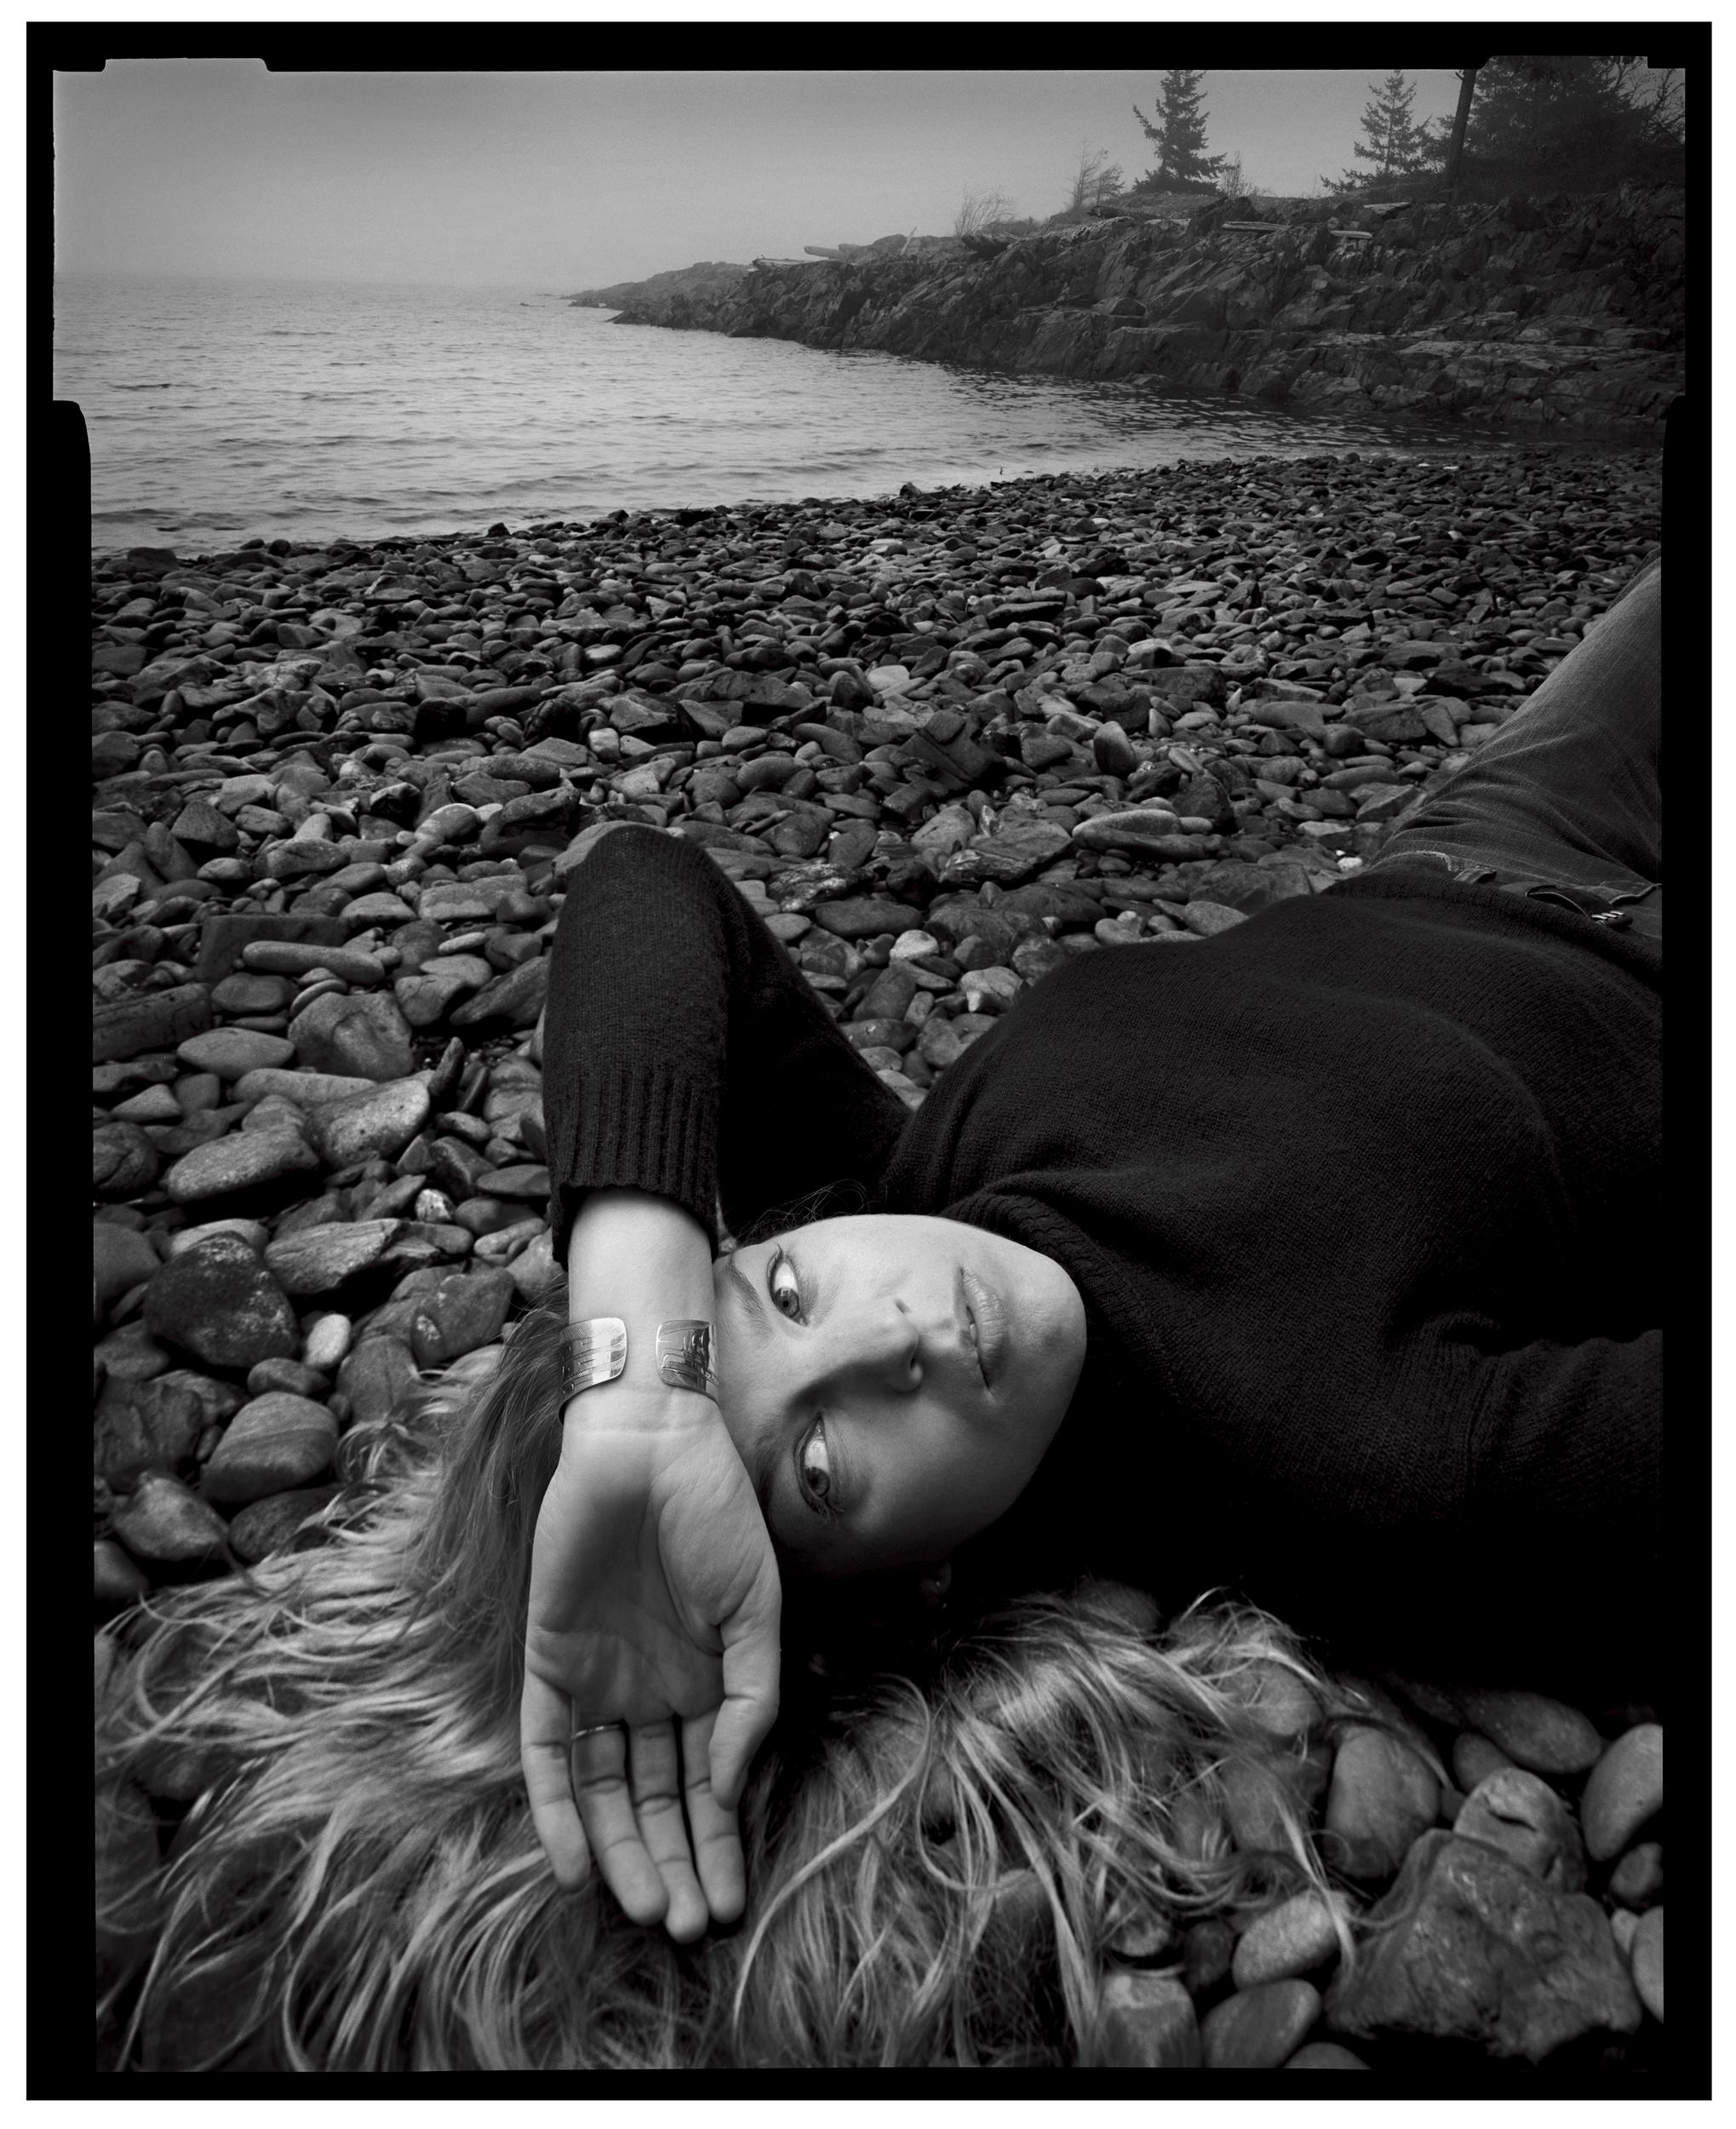 Diana Krall, Vancouver, Canada, 2003